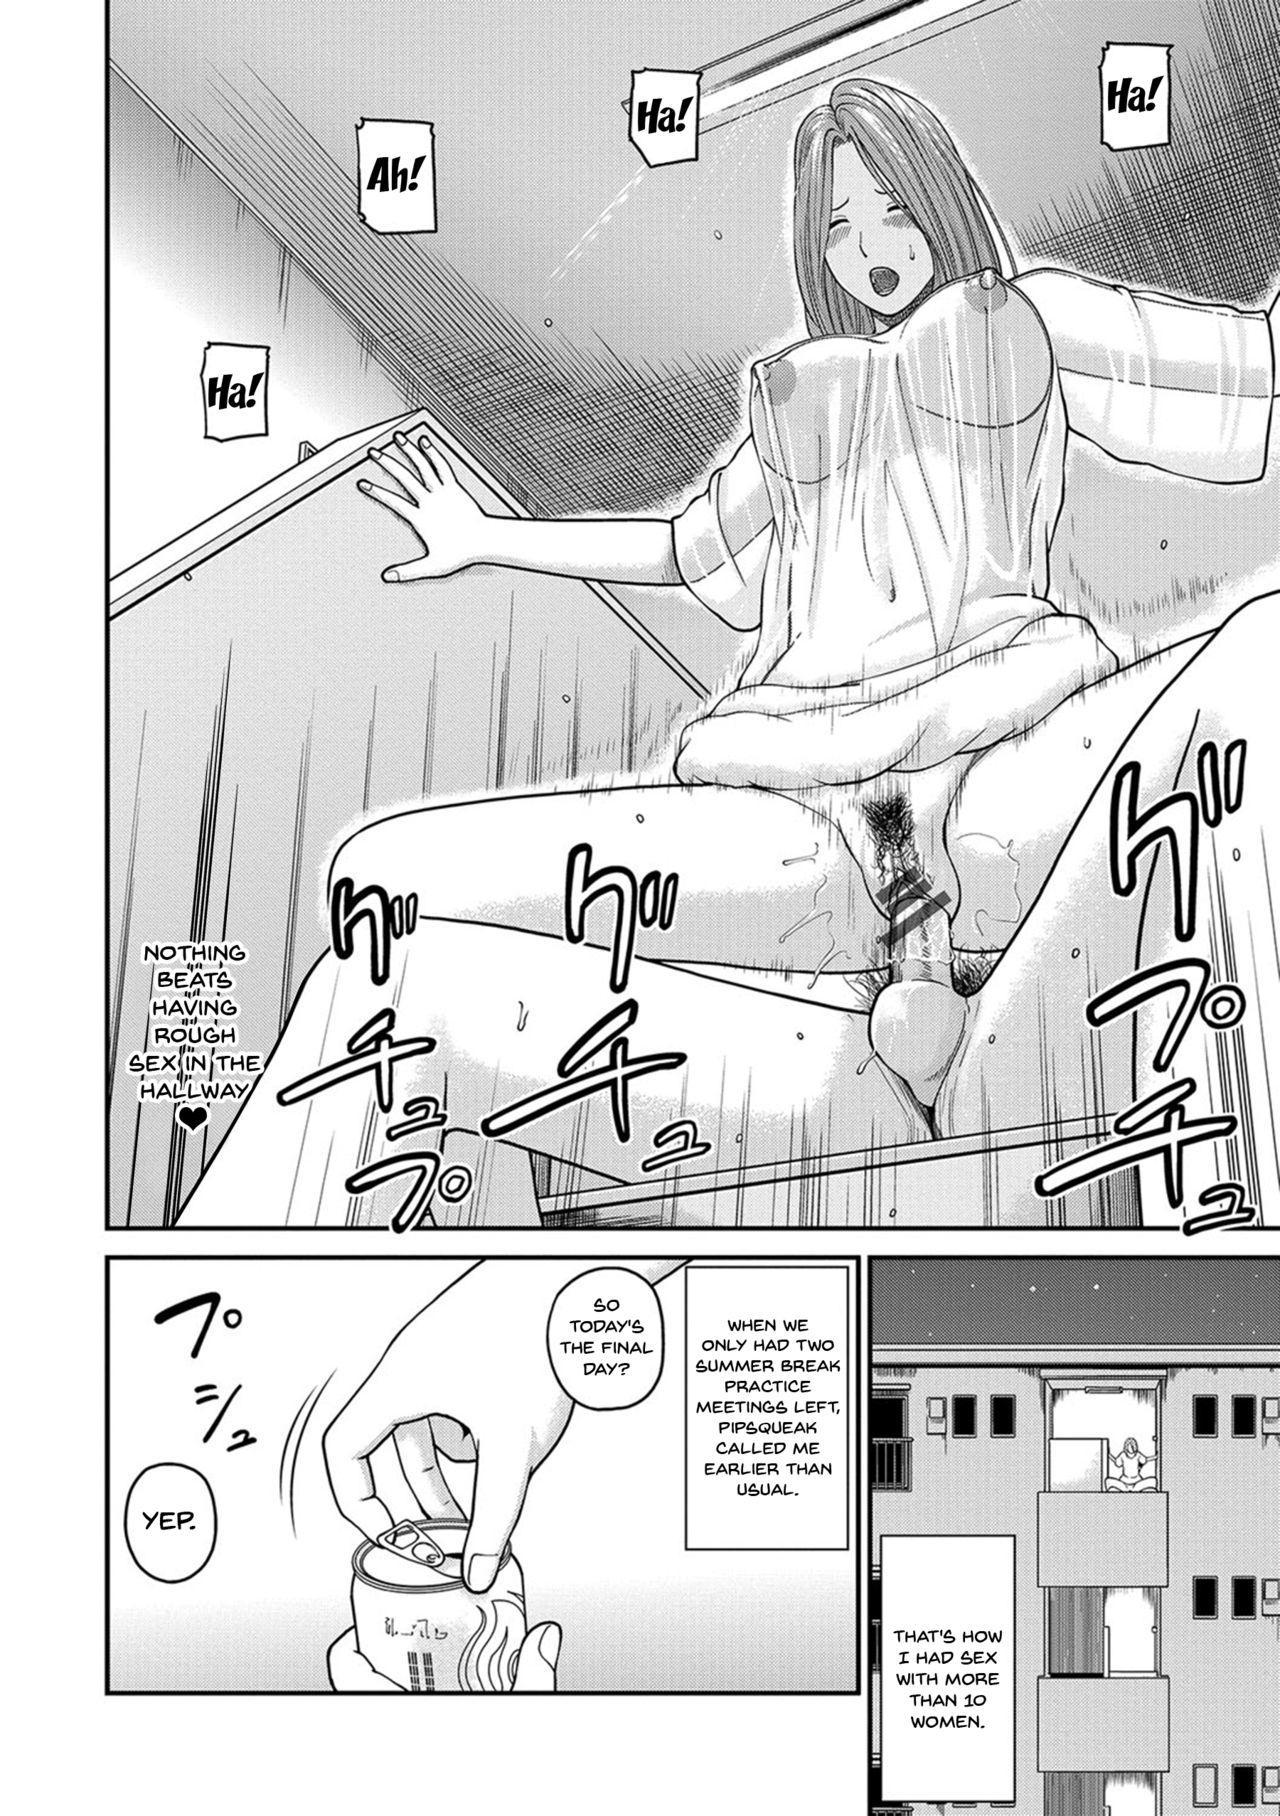 [Kuroki Hidehiko] Momojiri Danchi Mama-san Volley Doukoukai - Mom's Volley Ball | Momojiri District Mature Women's Volleyball Club Ch.1-9 [English] {Doujins.com} [Digital] 103